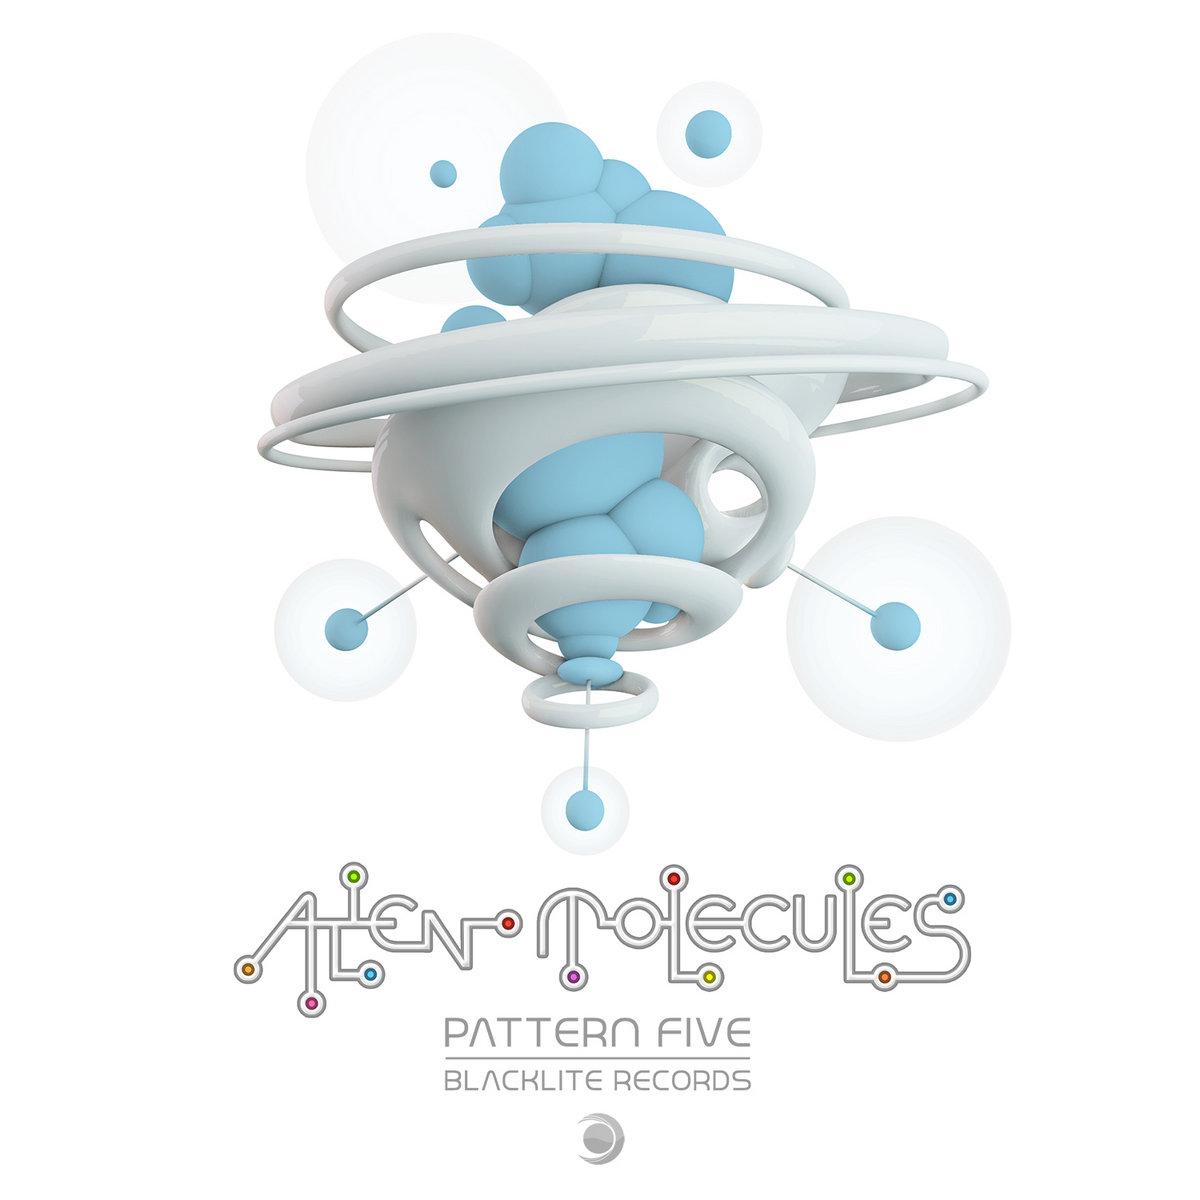 Alien Molecules - Pattern Five - V A  (Blacklite Records